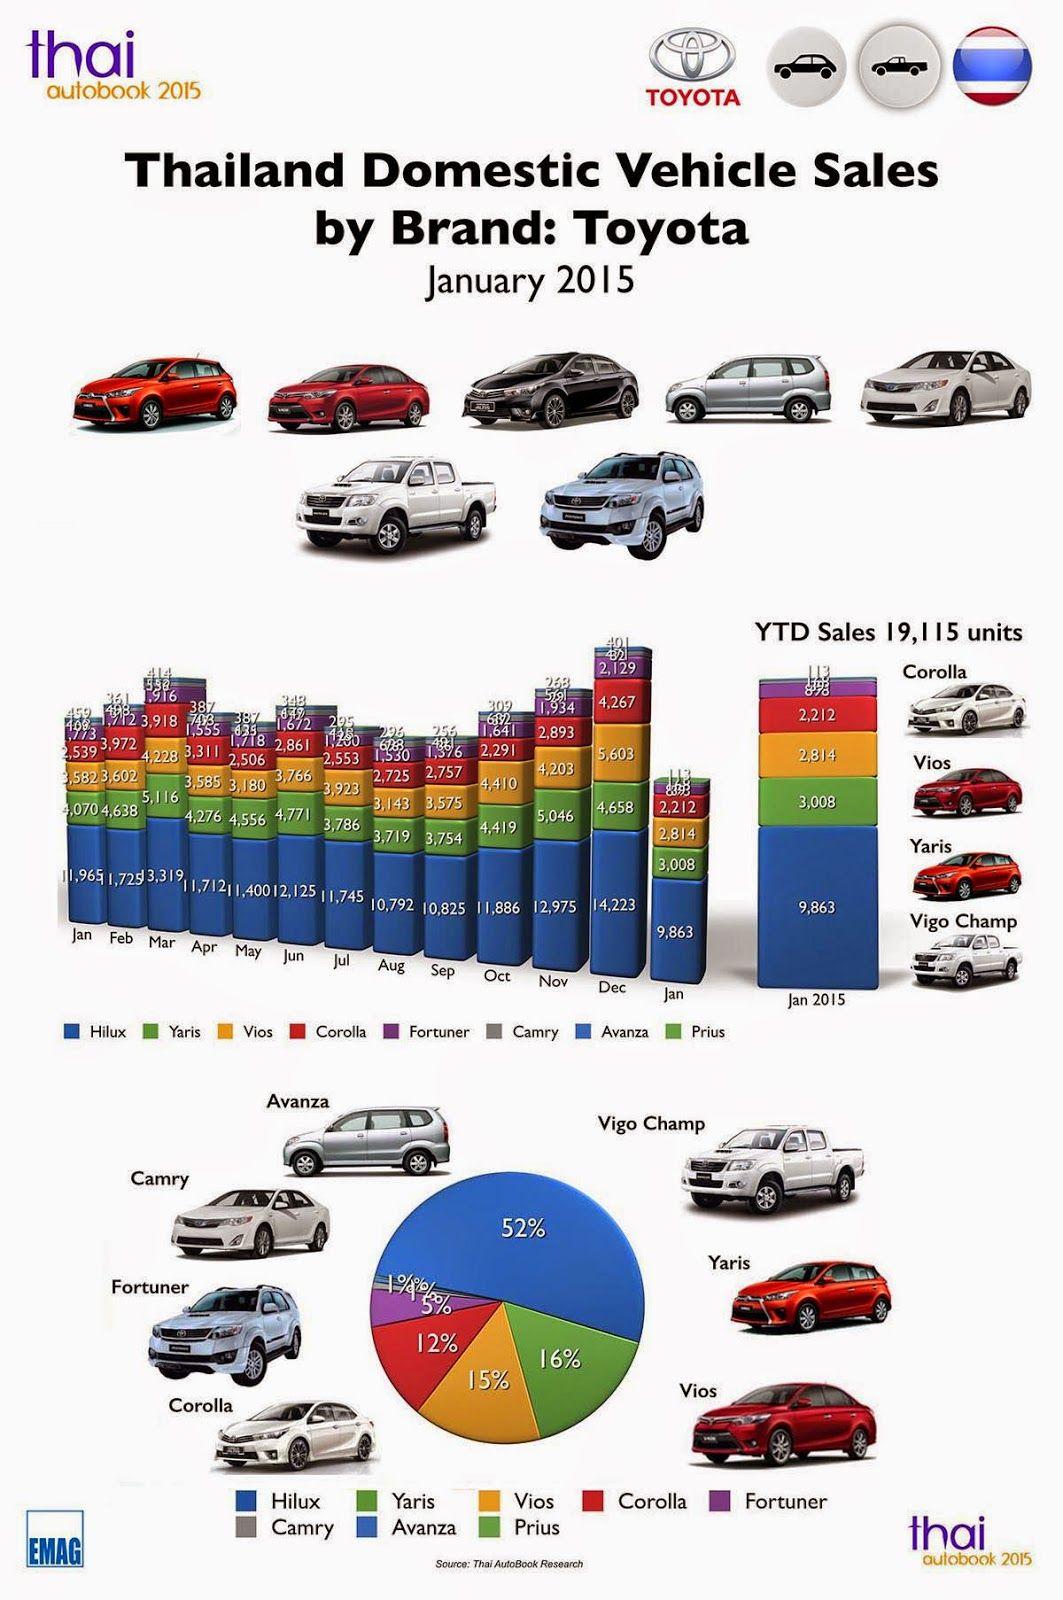 Thai autobook infographic thailand car sales january 2015 toyota